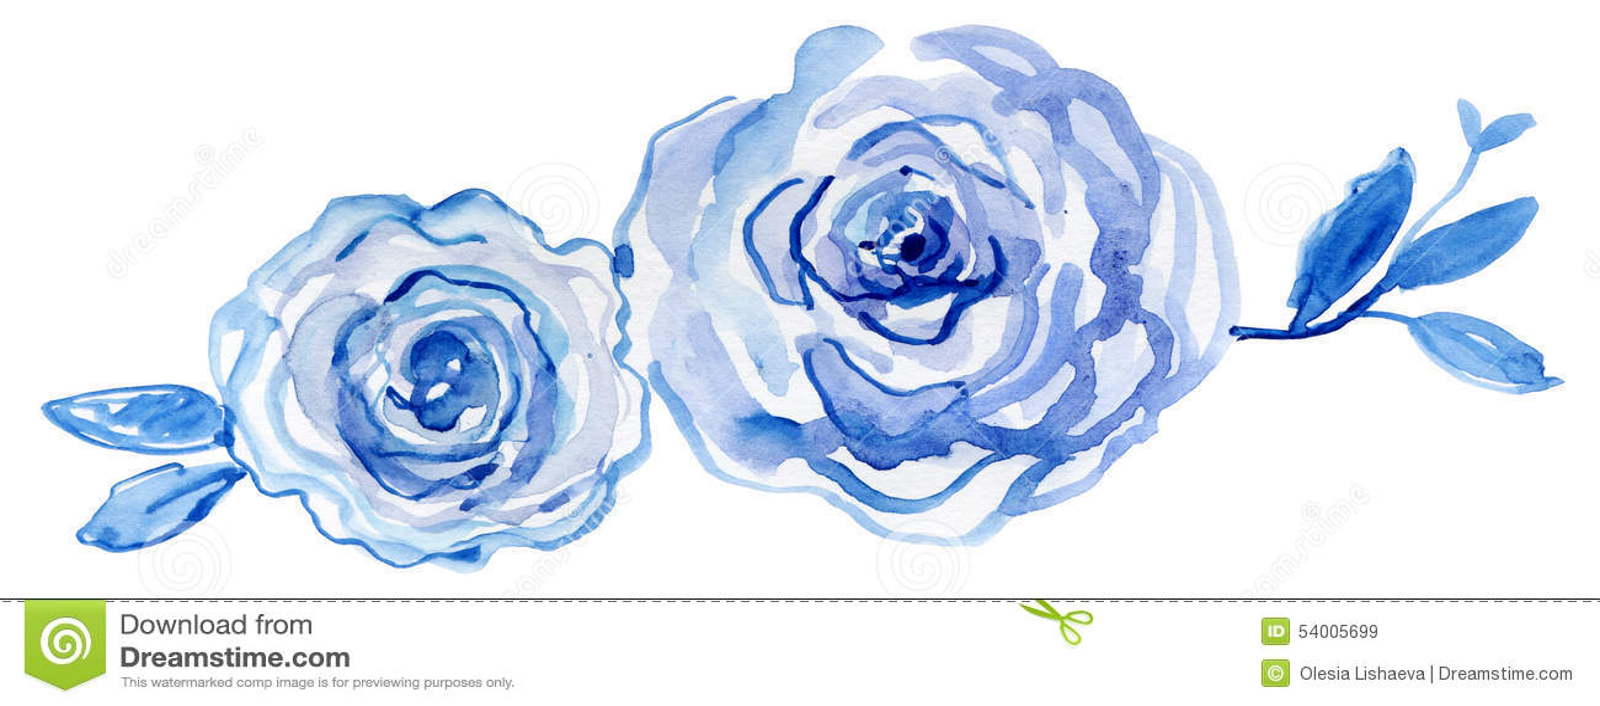 Blaue Rosen Aquarell handgemalt, Weinleseillustration